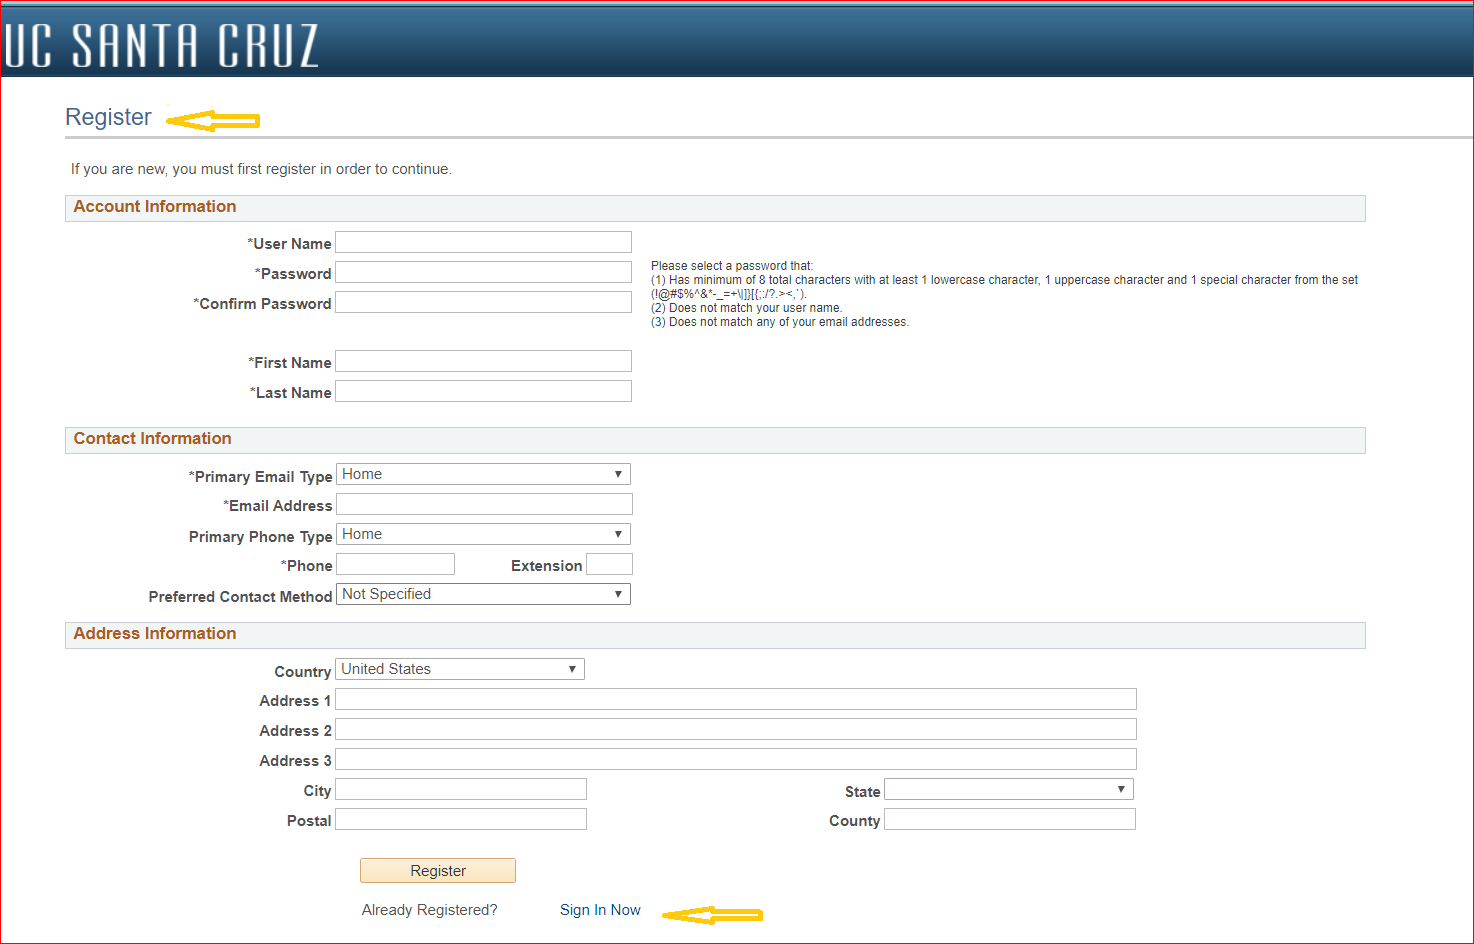 screenshot of the register screen.